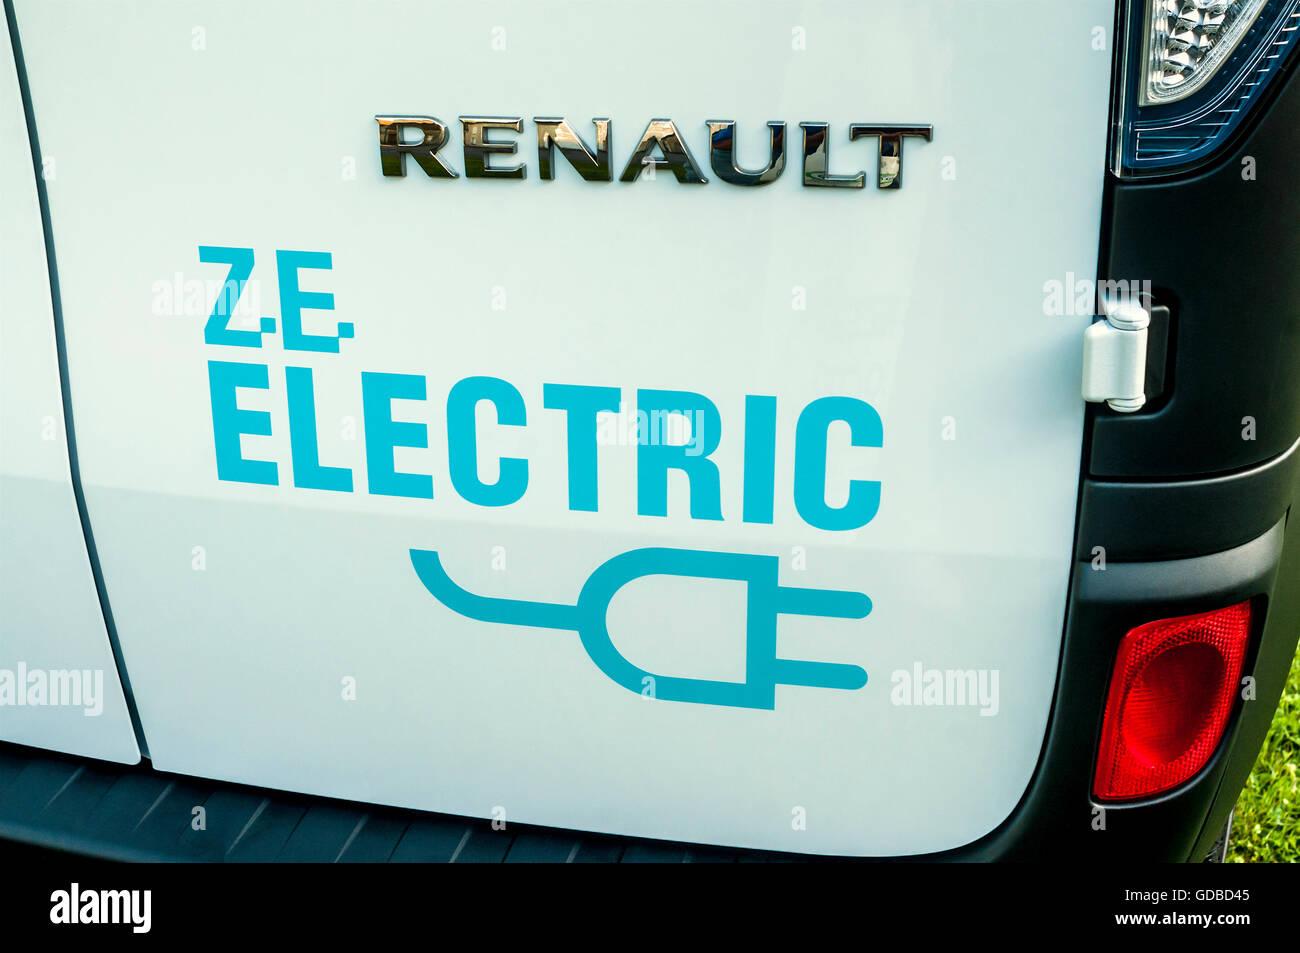 Logo of Renault ZE Electric van - France. Stock Photo